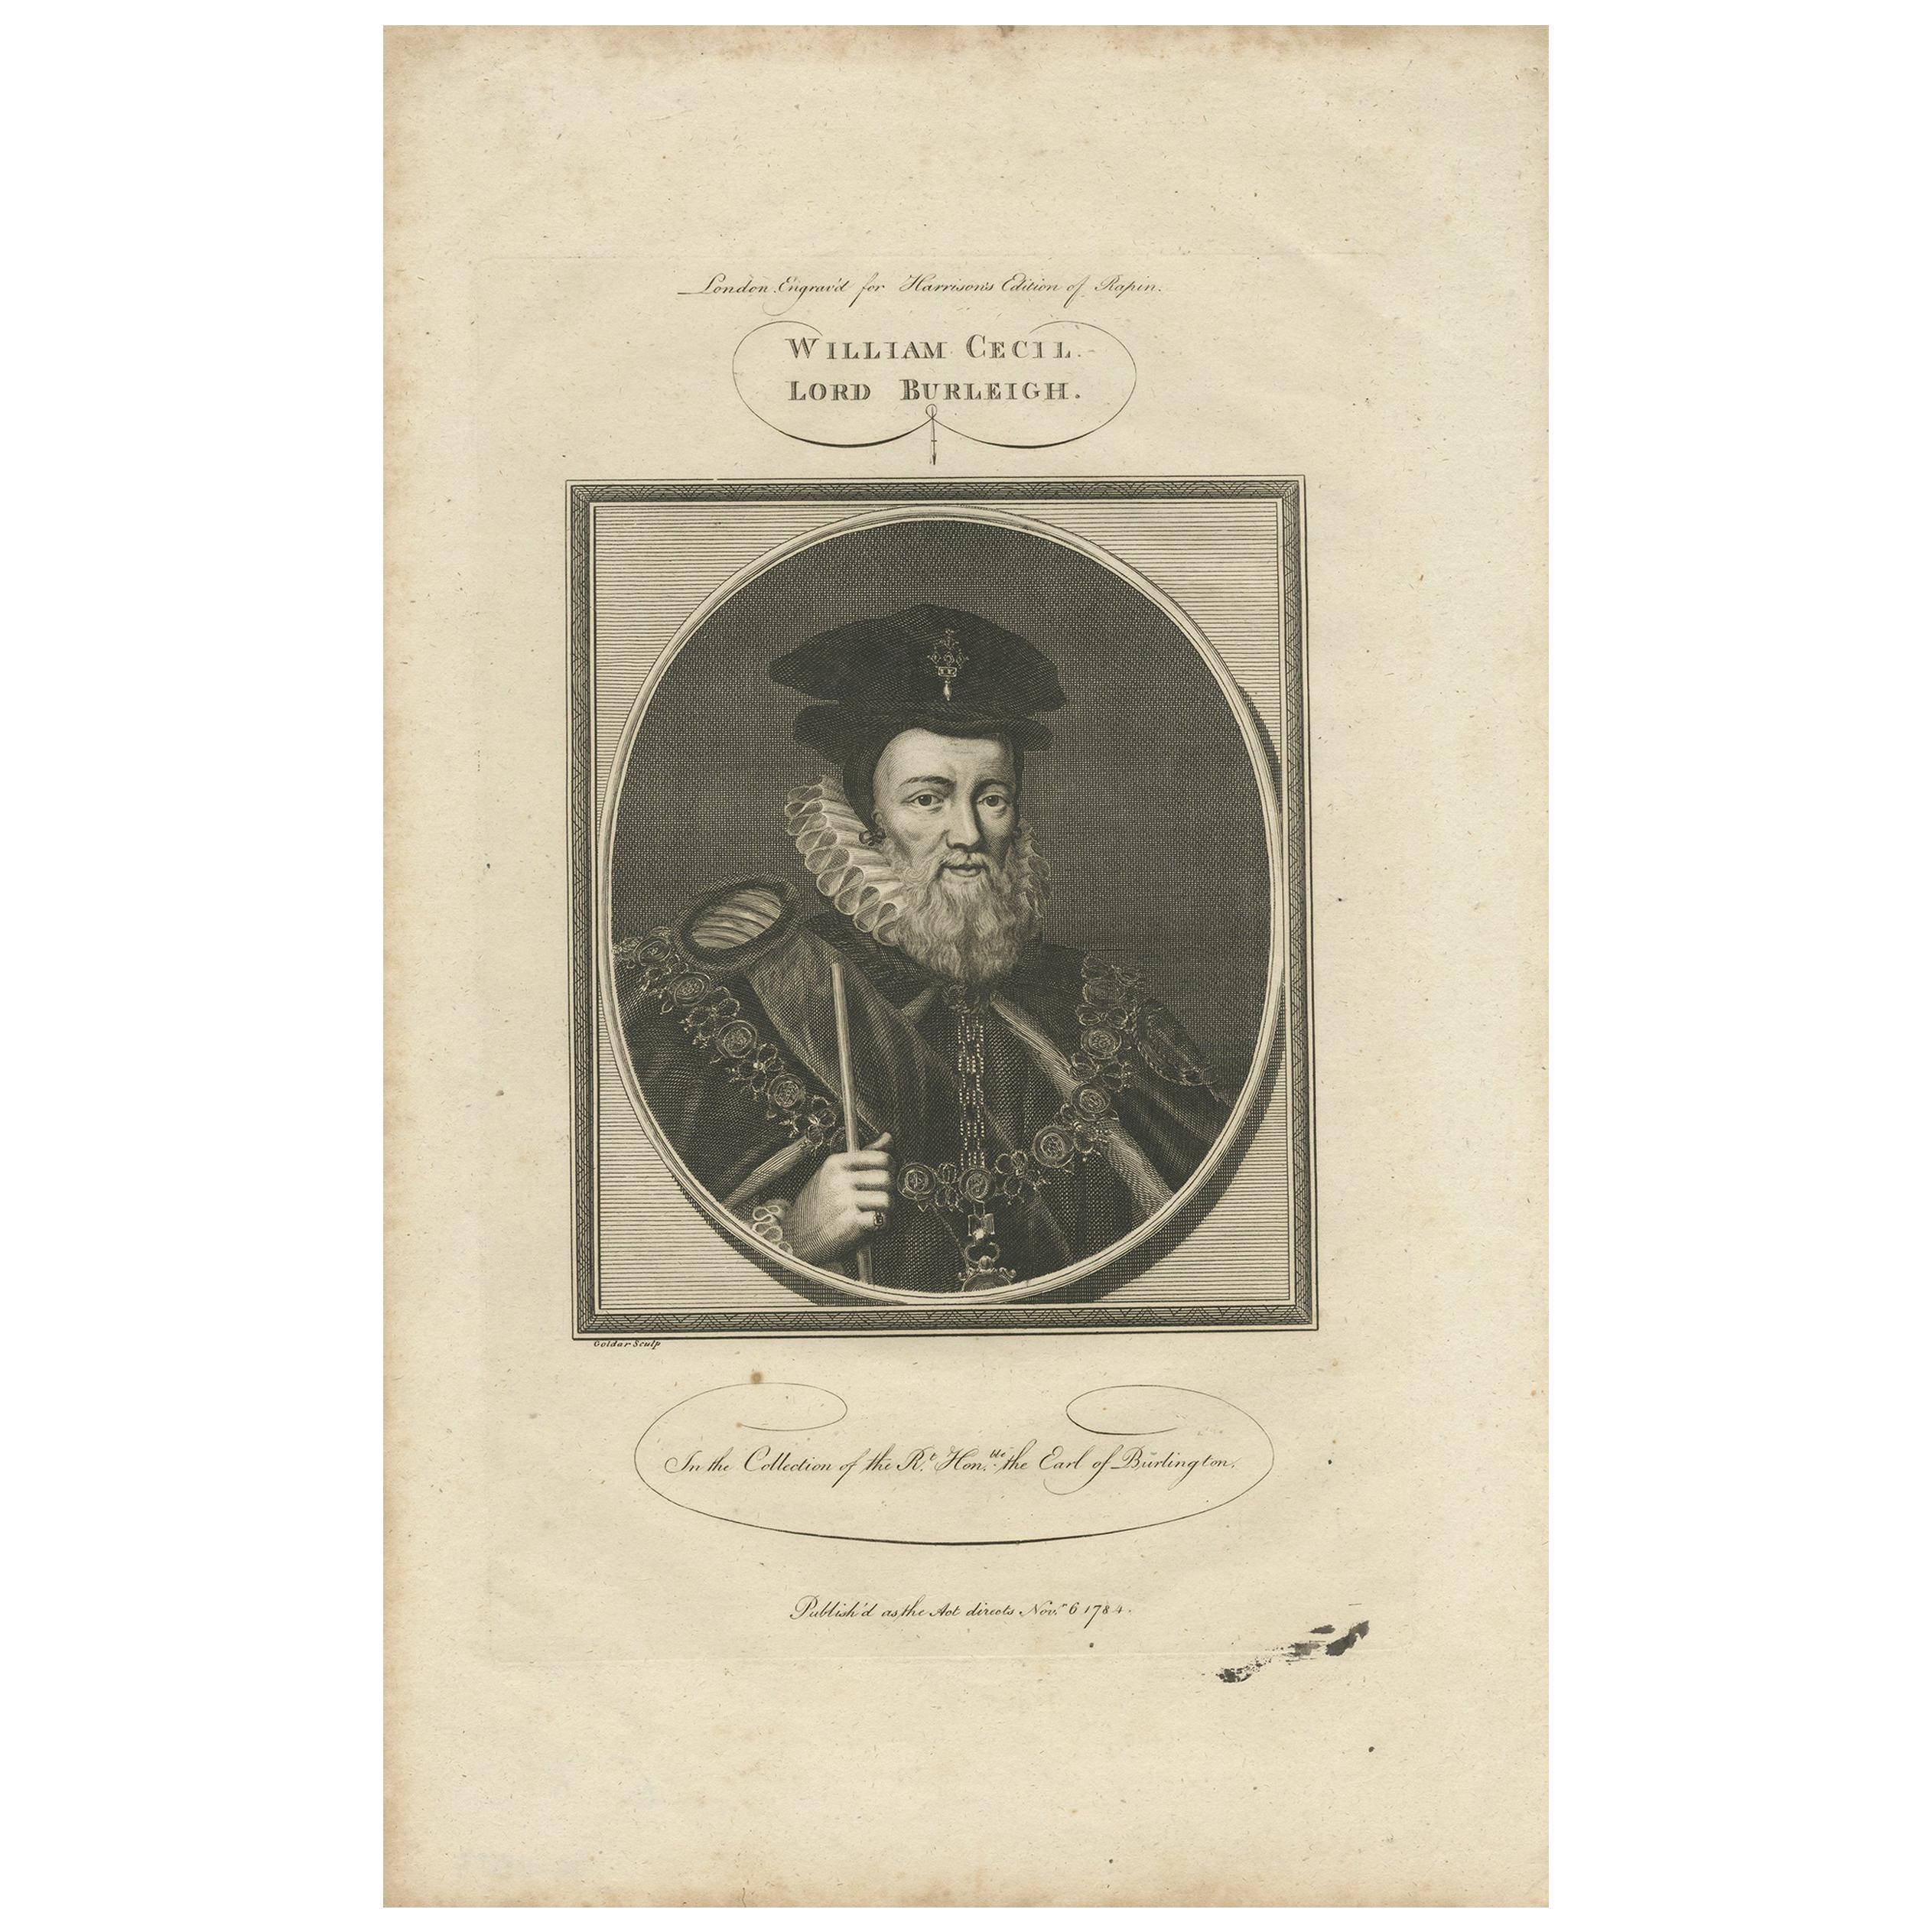 Antique Portrait of William Cecil by Goldar, 1784